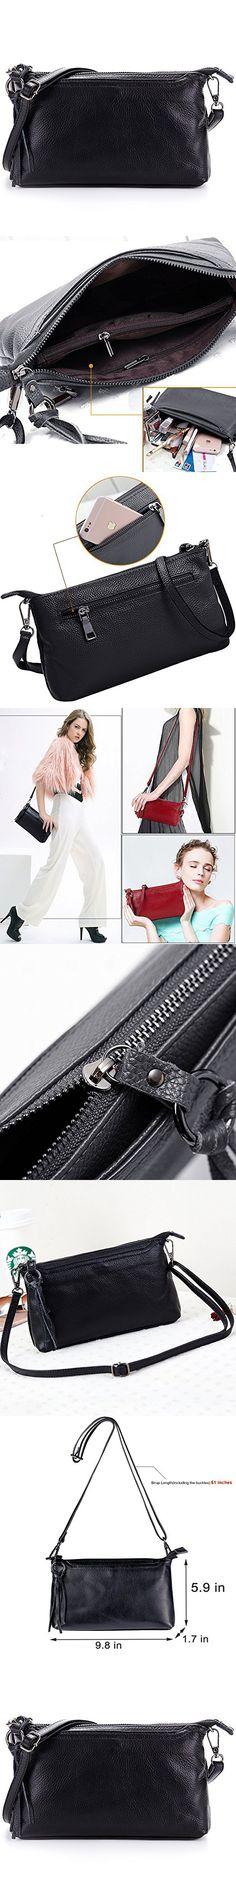 Lecxci Womens Real Leather Smartphone Crossbody Bag, Zipper Clutch Wallet Purse for Women Teen Girls (Black)